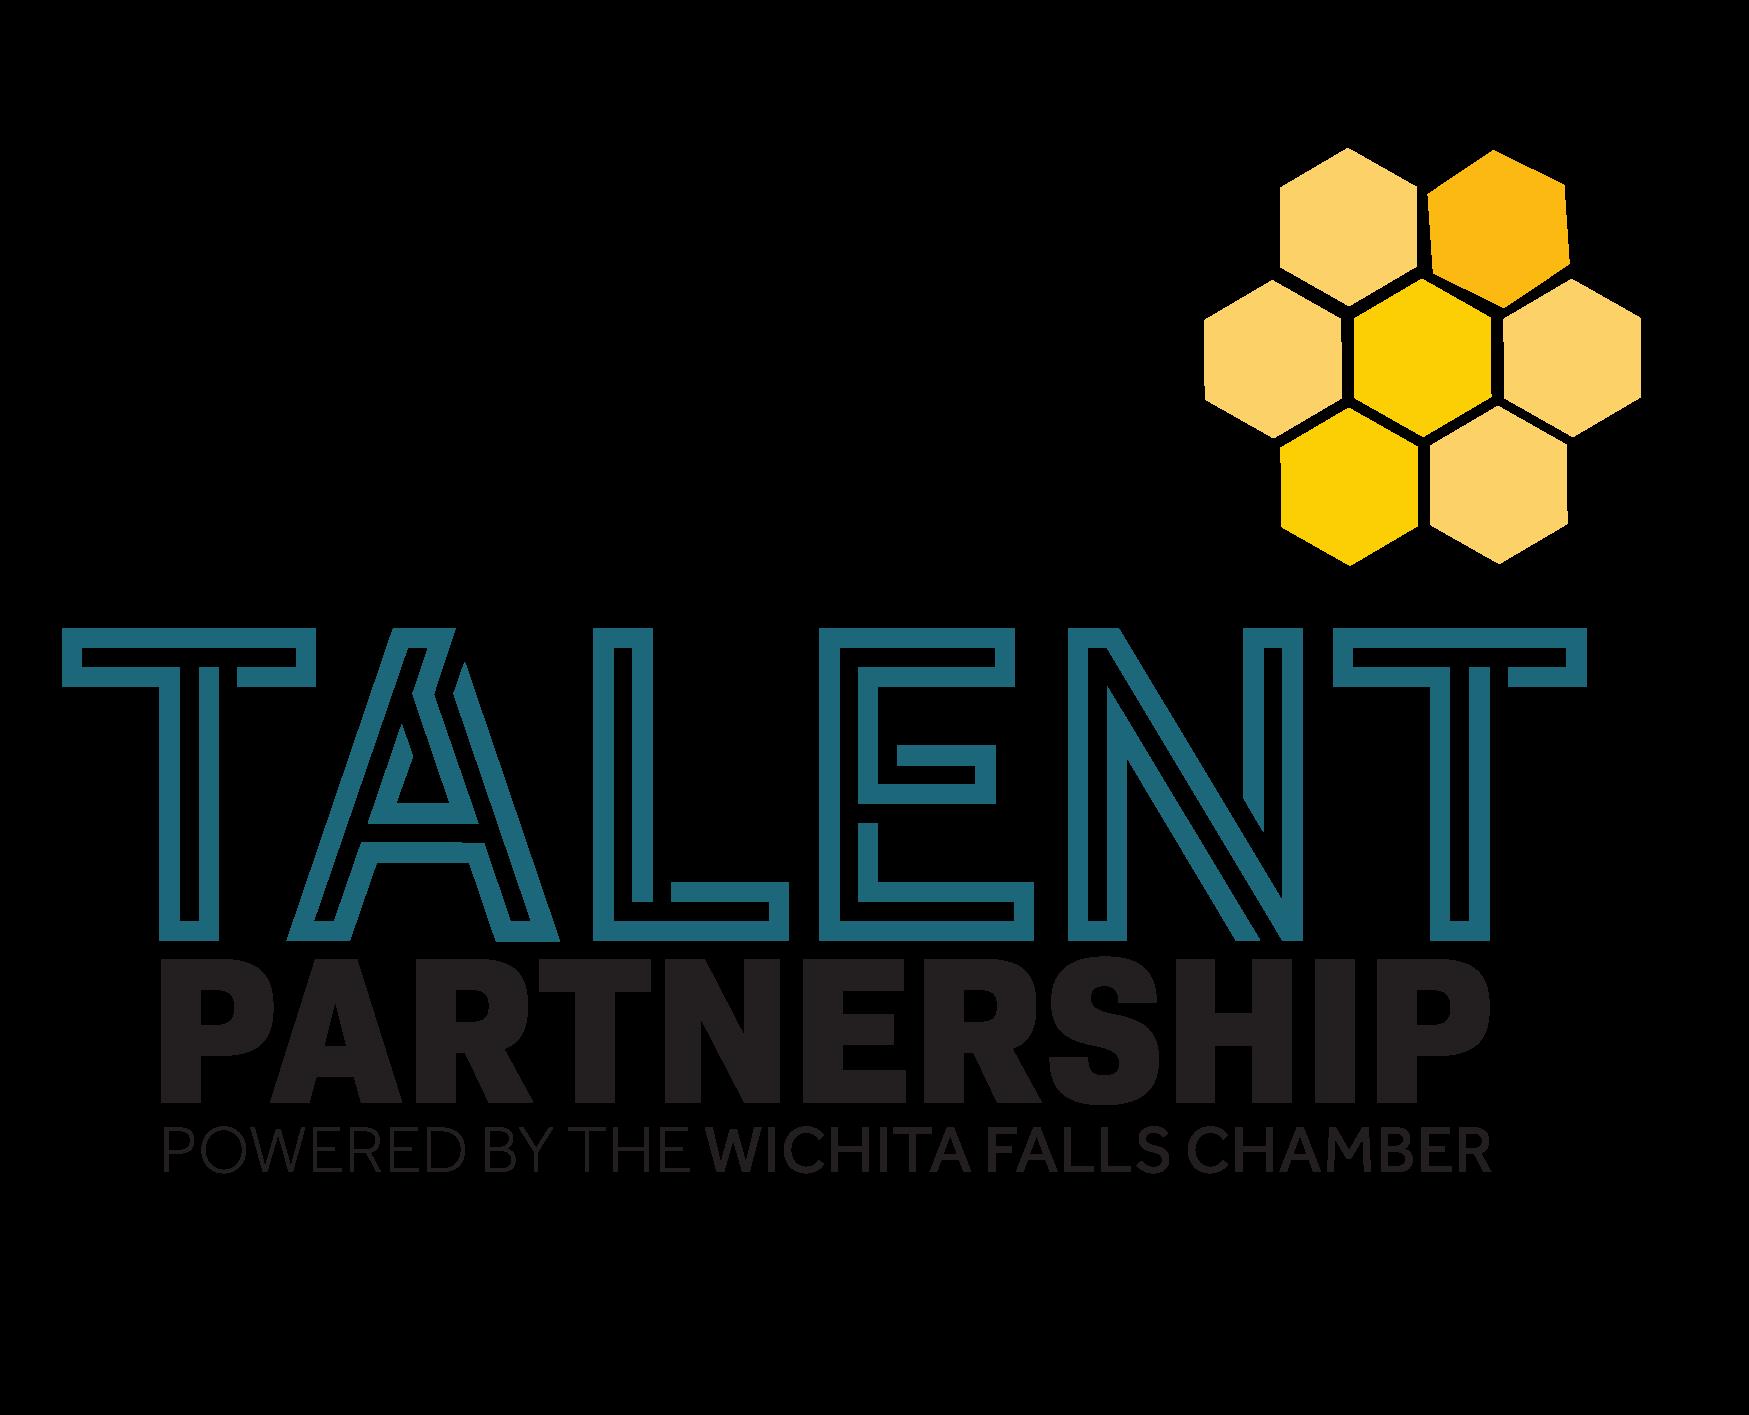 Talent_Partnership_Final-3c